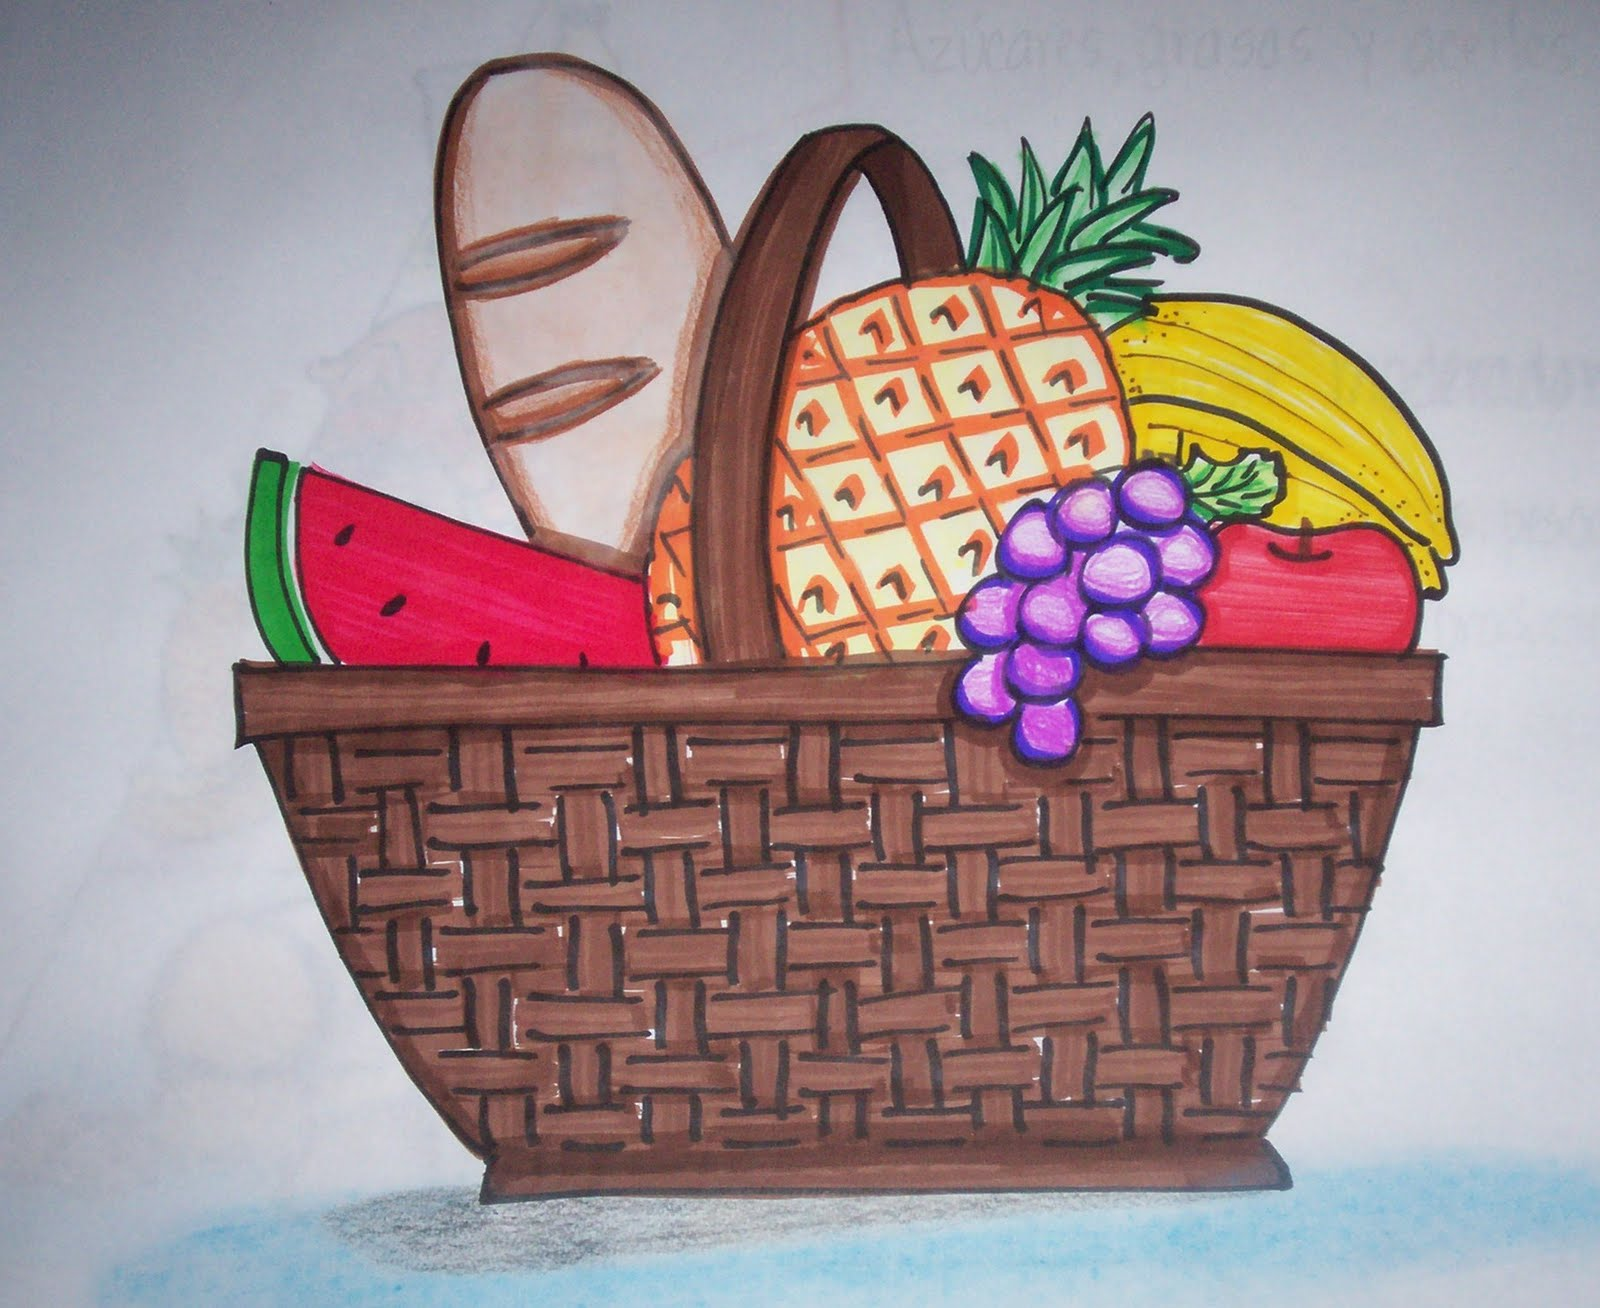 Ma  Ana Se Celebra El Dia De La Alimentacion En Mi Pais Por Lo Que Les